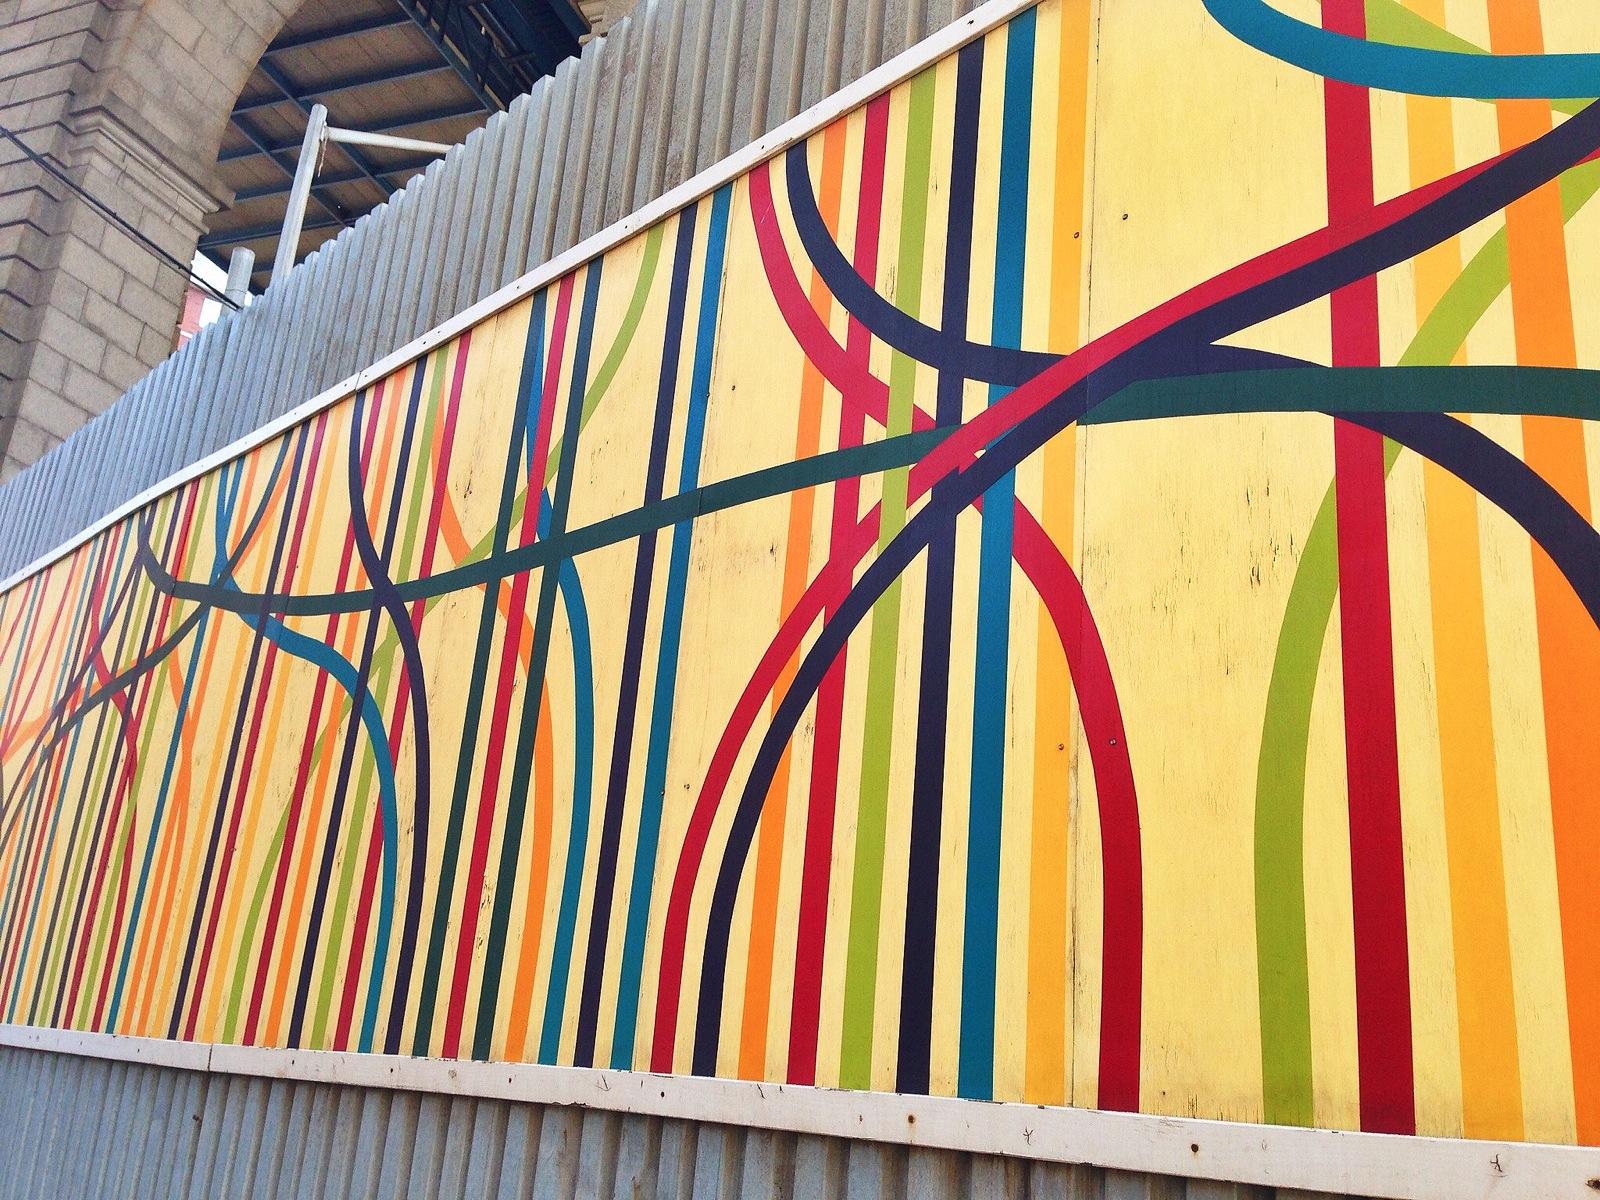 Street Art (Brooklyn, NYC)